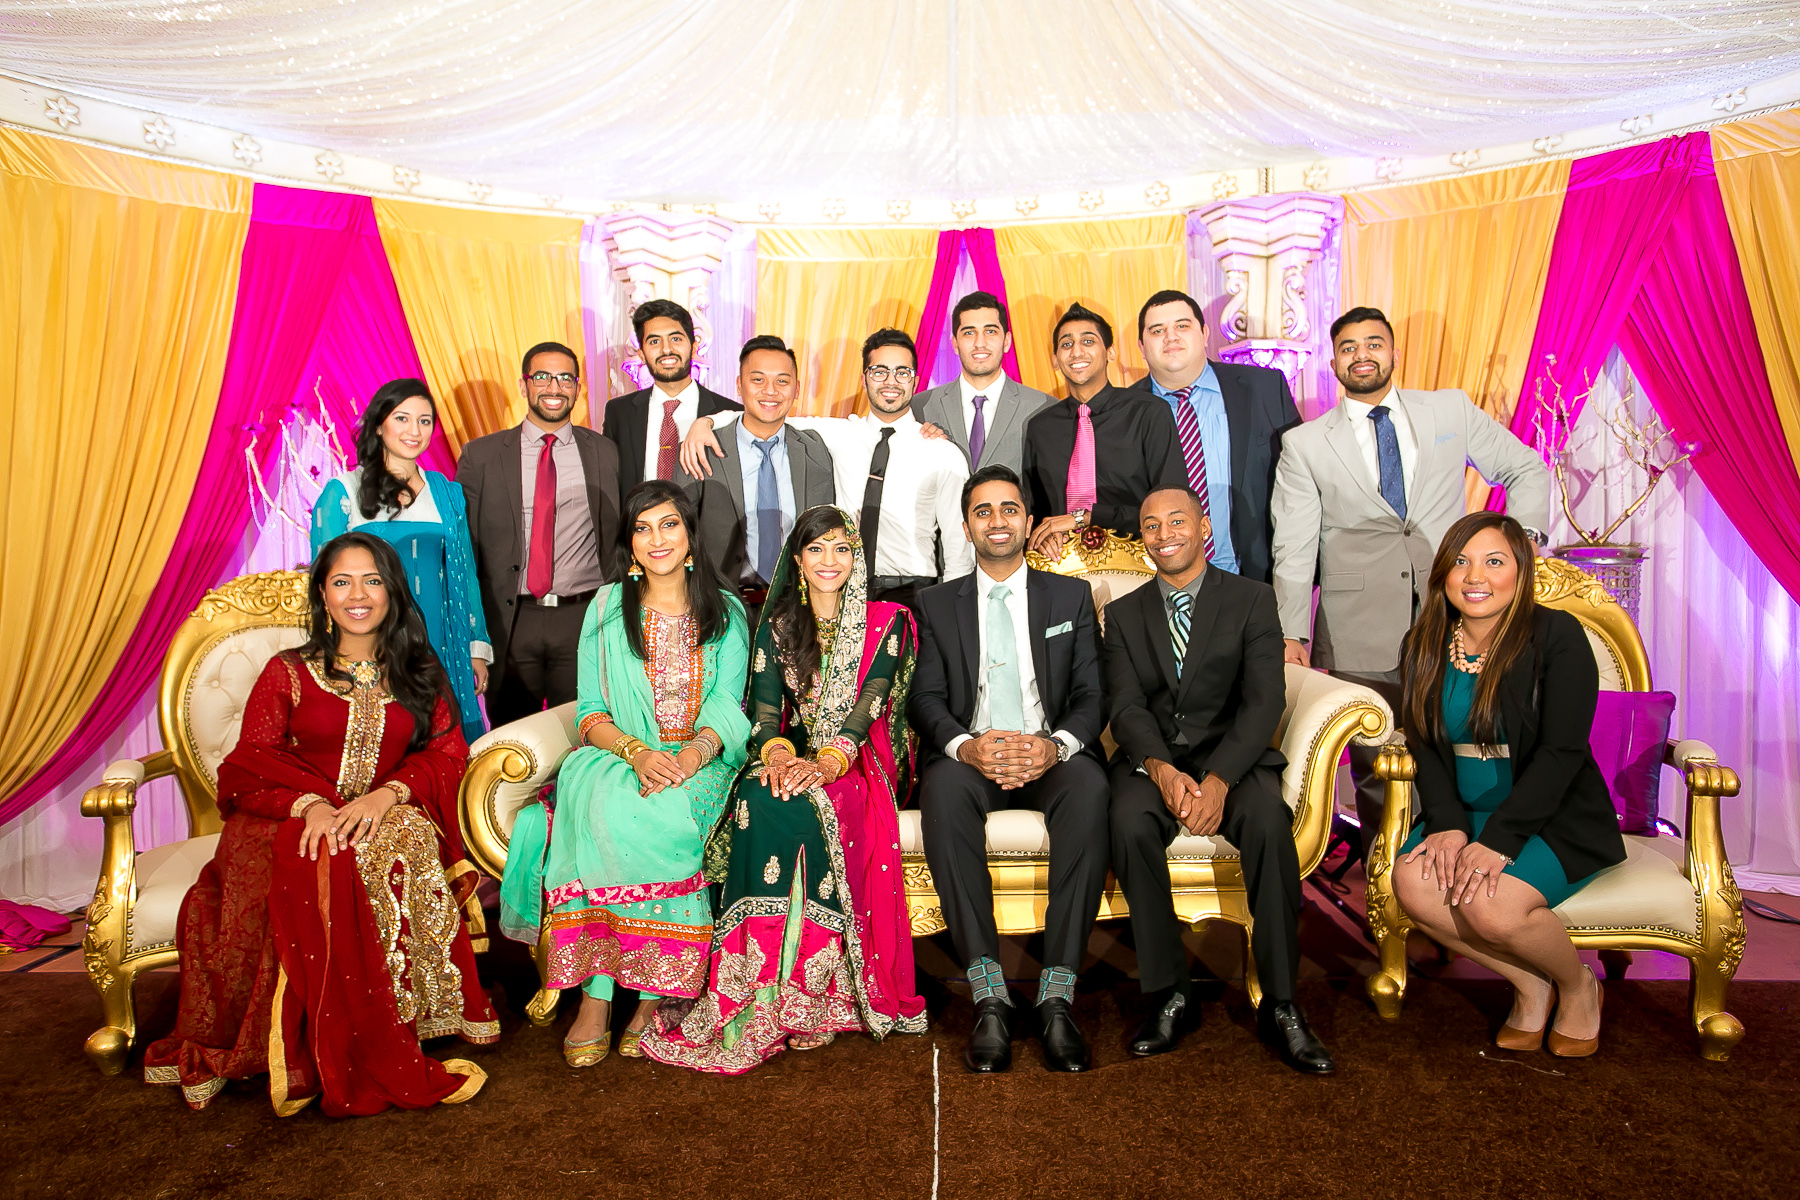 Saira-and-Auhim-Wedding-December-27-2014-273.jpg